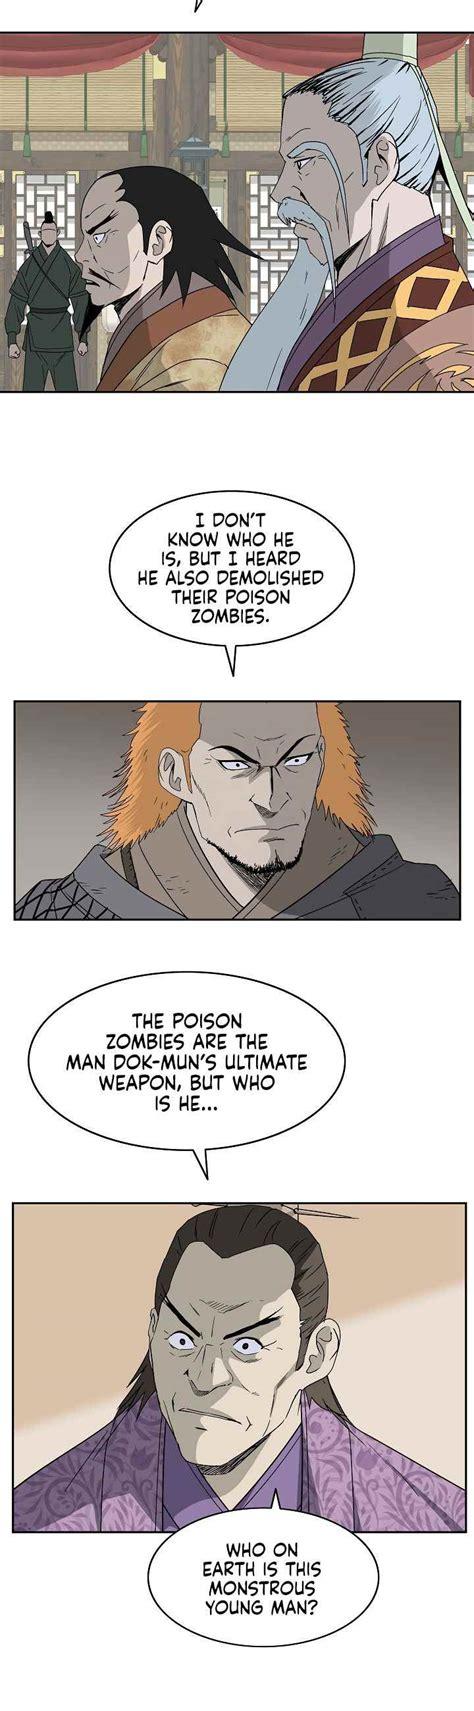 Best manhwa update fastest on manhwa 68 Read Manga Bowblade Spirit - Chapter 74 - Read manga online in English - Free manga reading